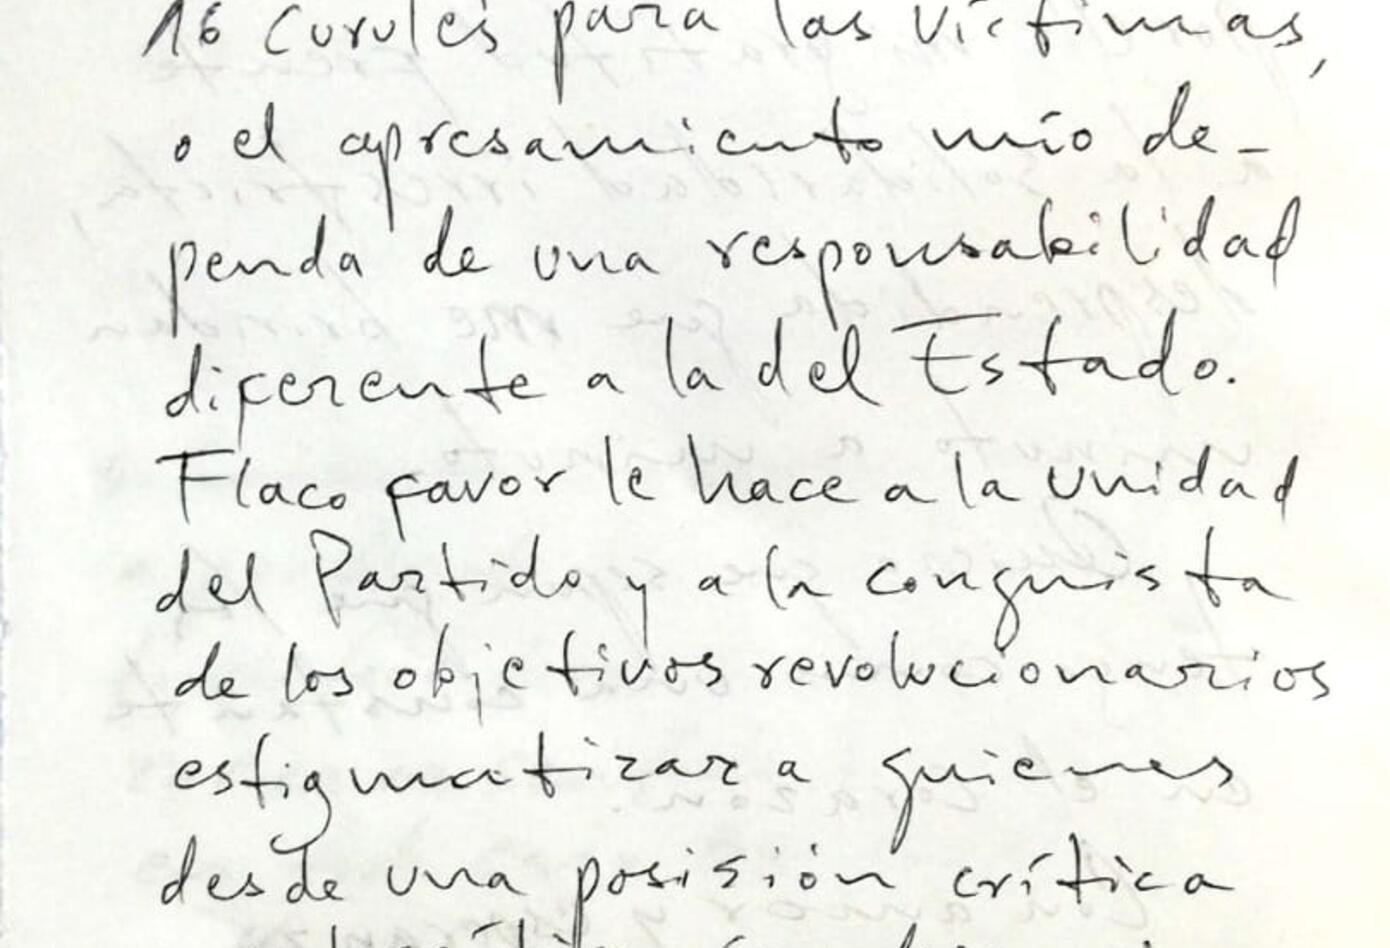 Carta Jesús Santrich 4